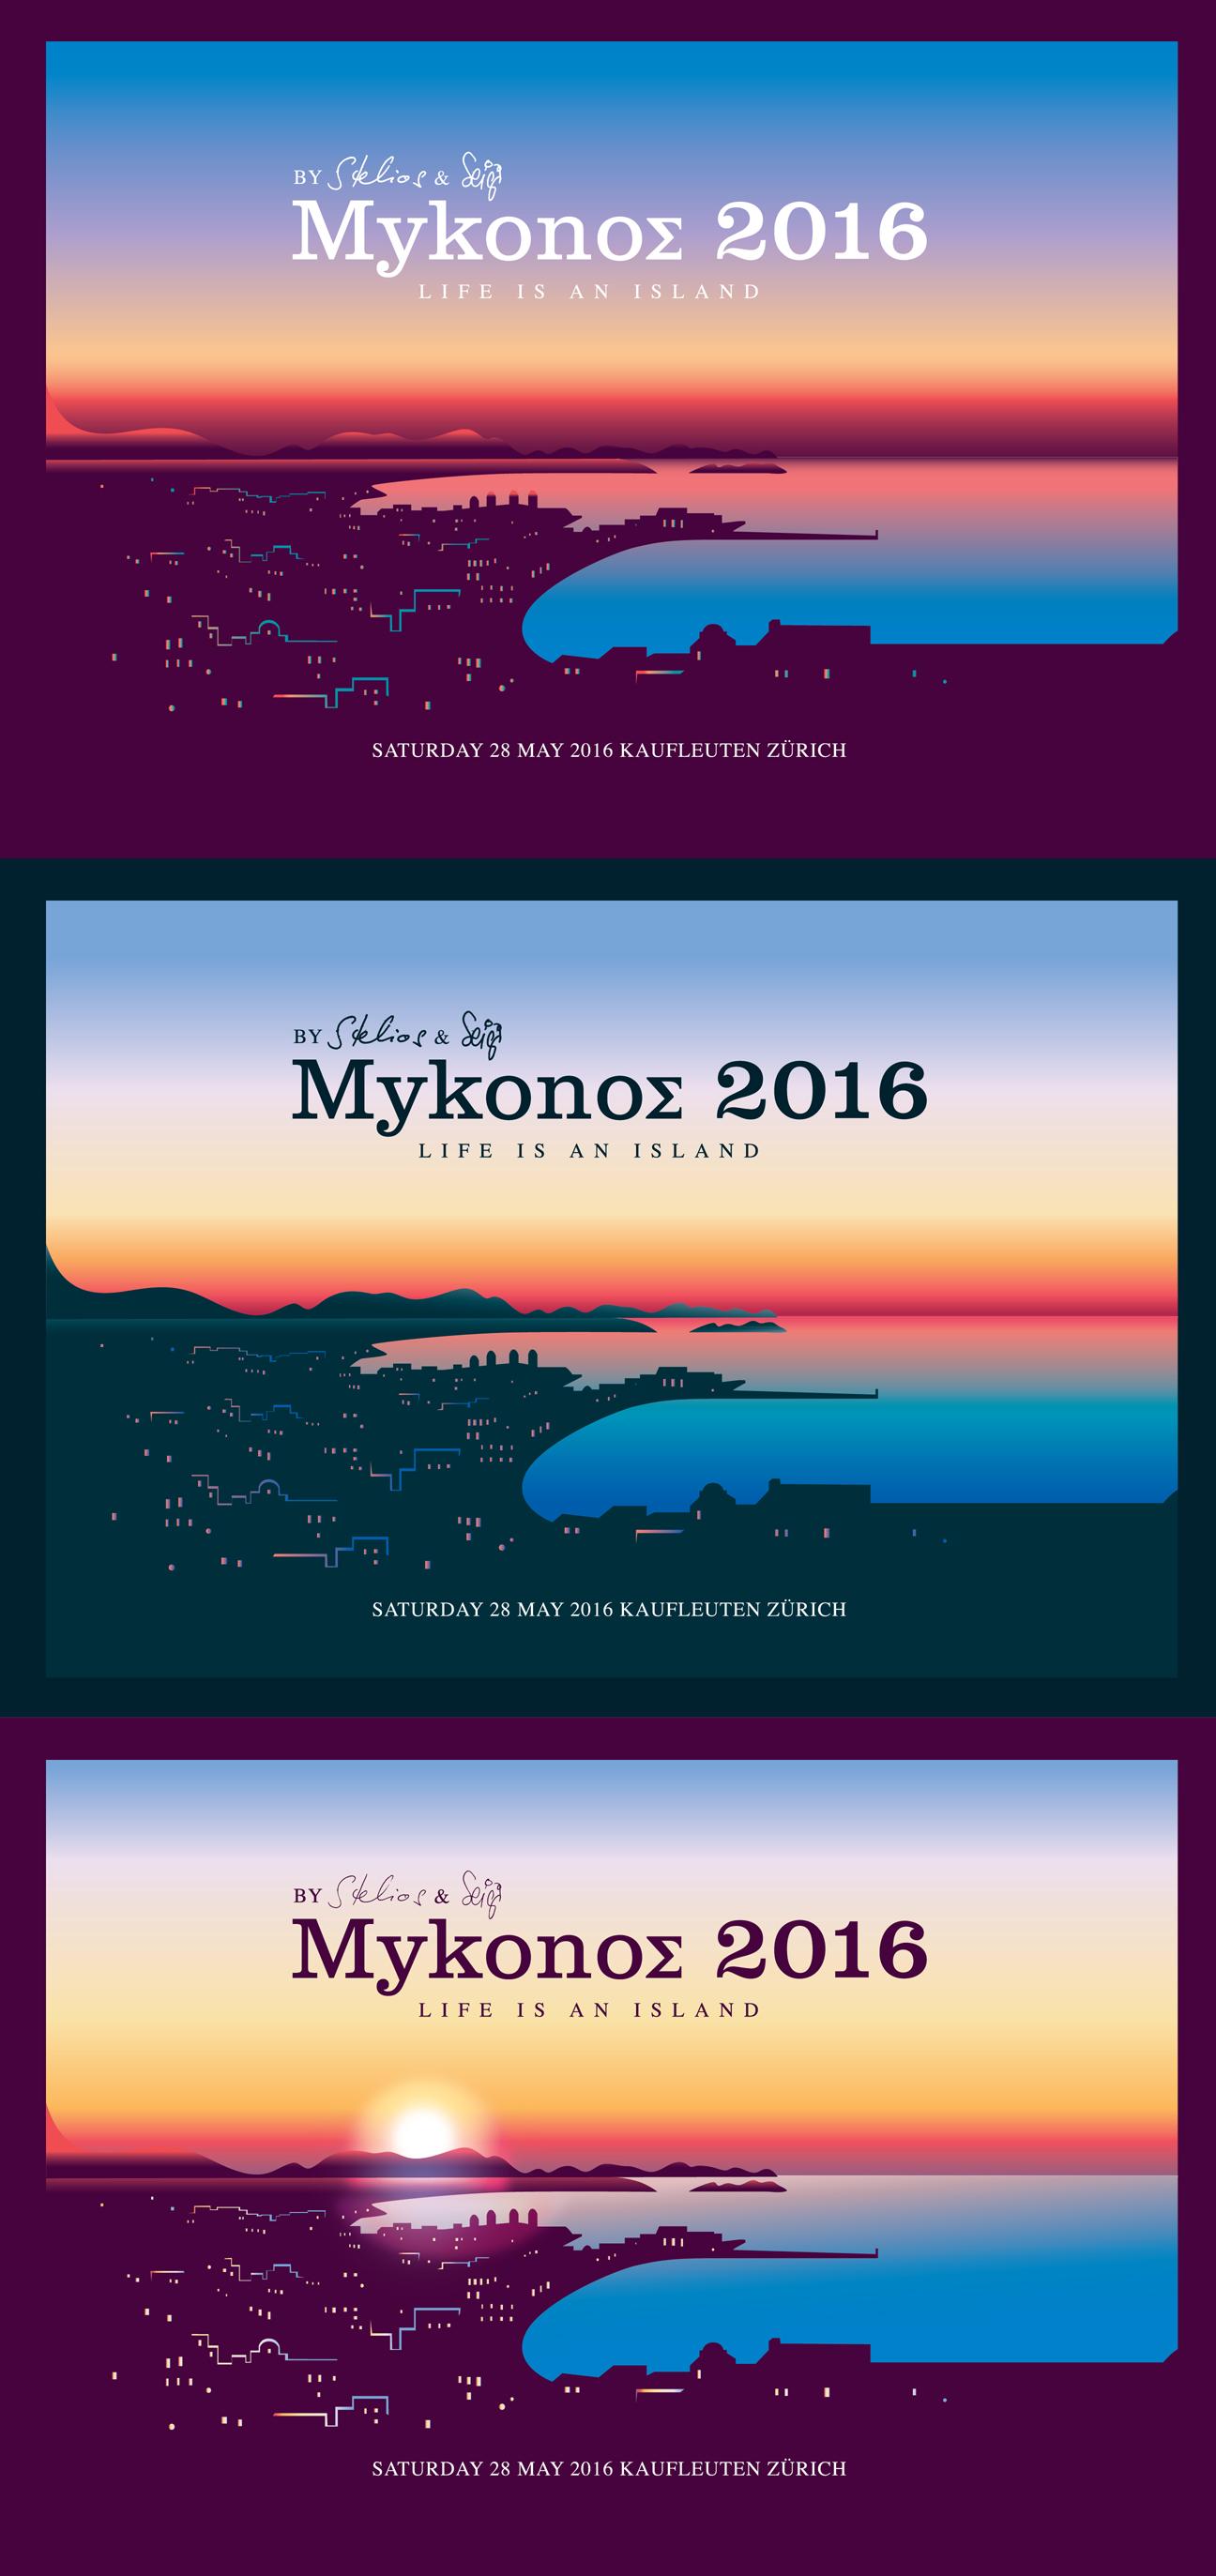 mykonos_detail_1_1296